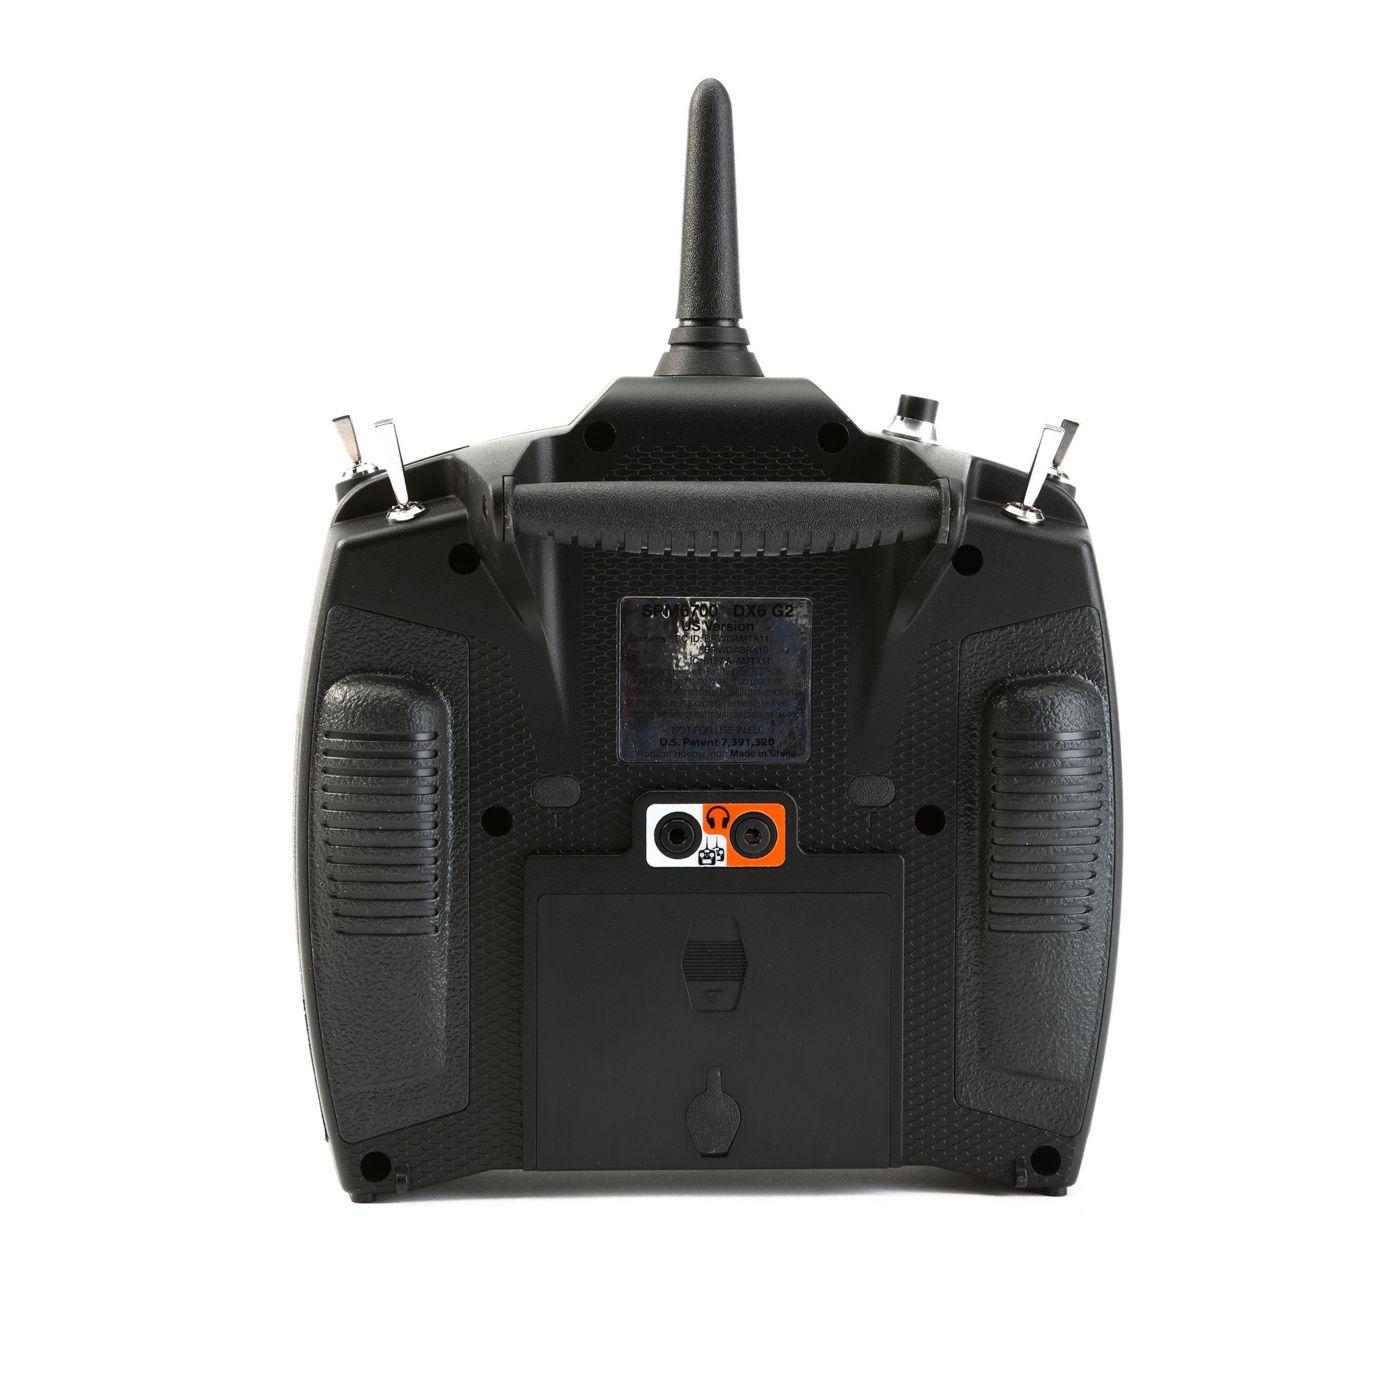 DX6 6-Channel DSMX Transmitter Gen 3 with AR6600T Receiver